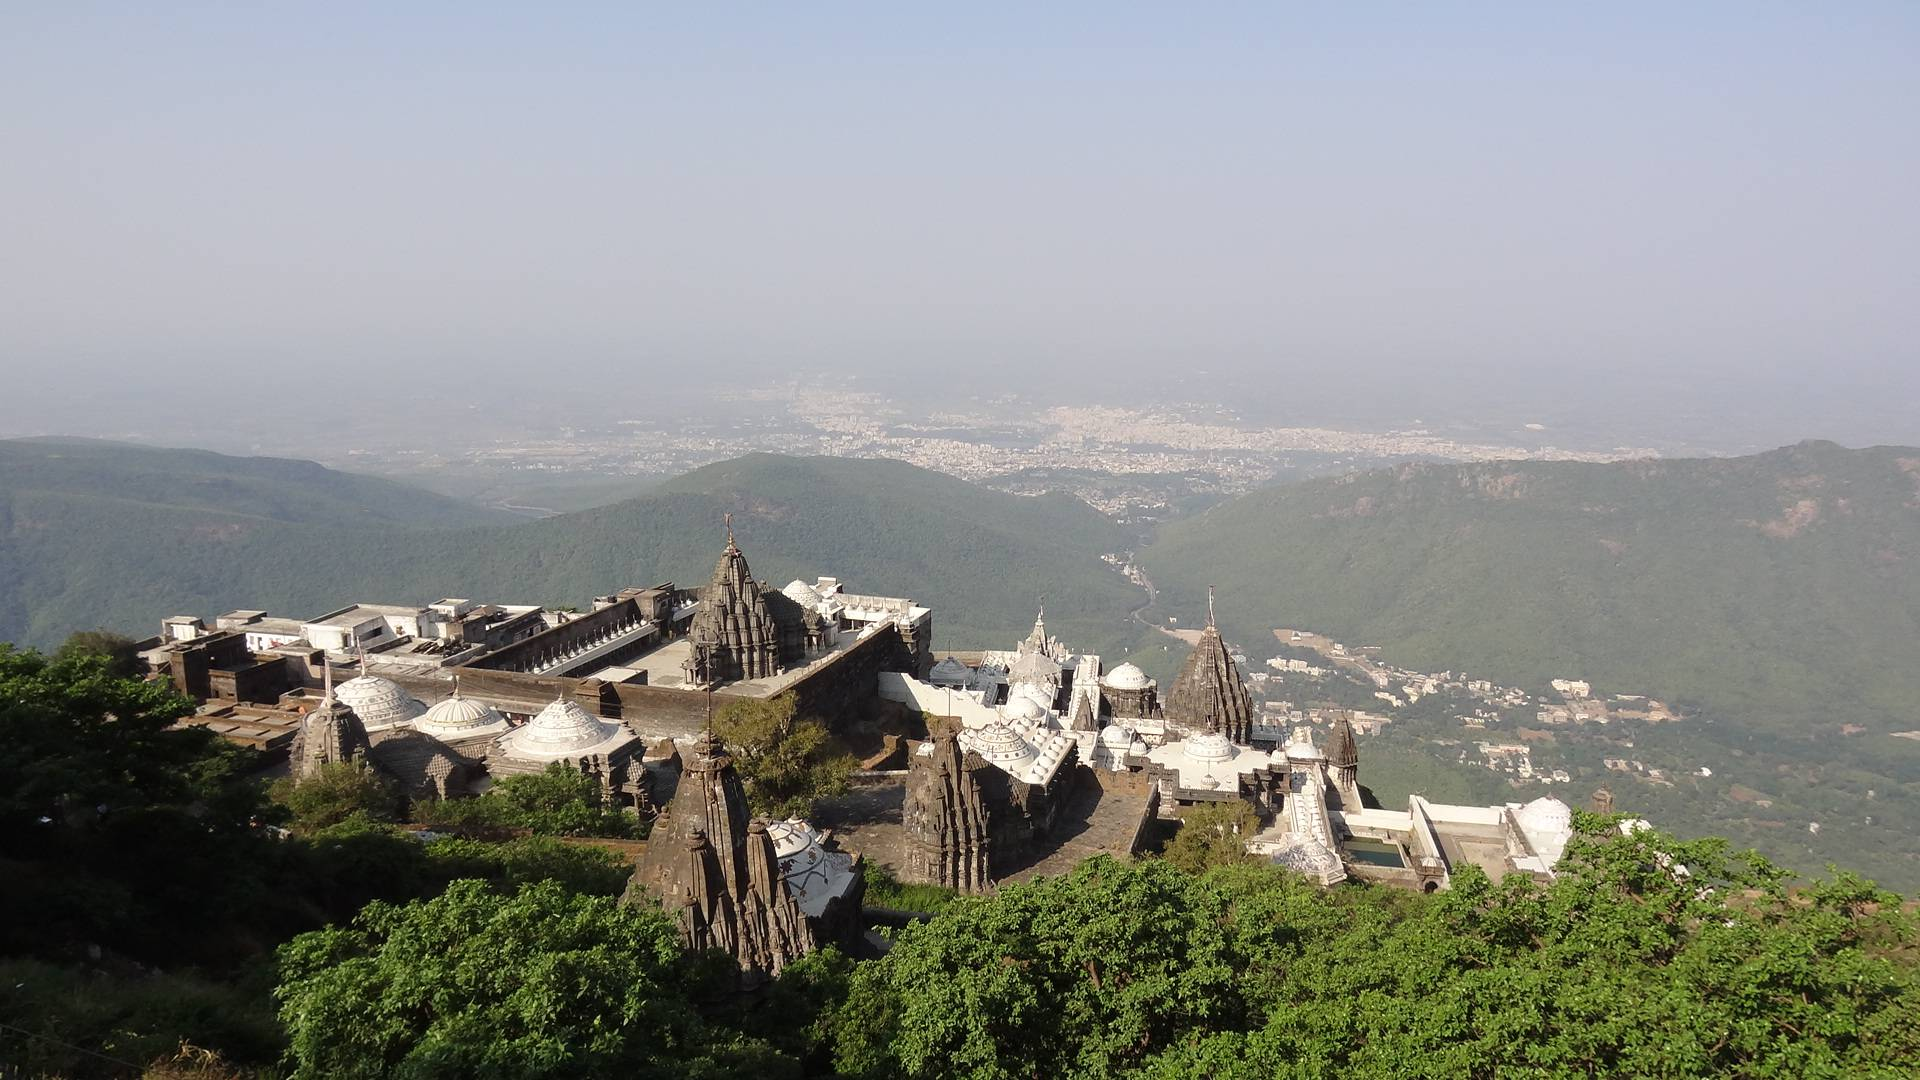 Photo 2: Un lieu de pèlerinage au Gujarat